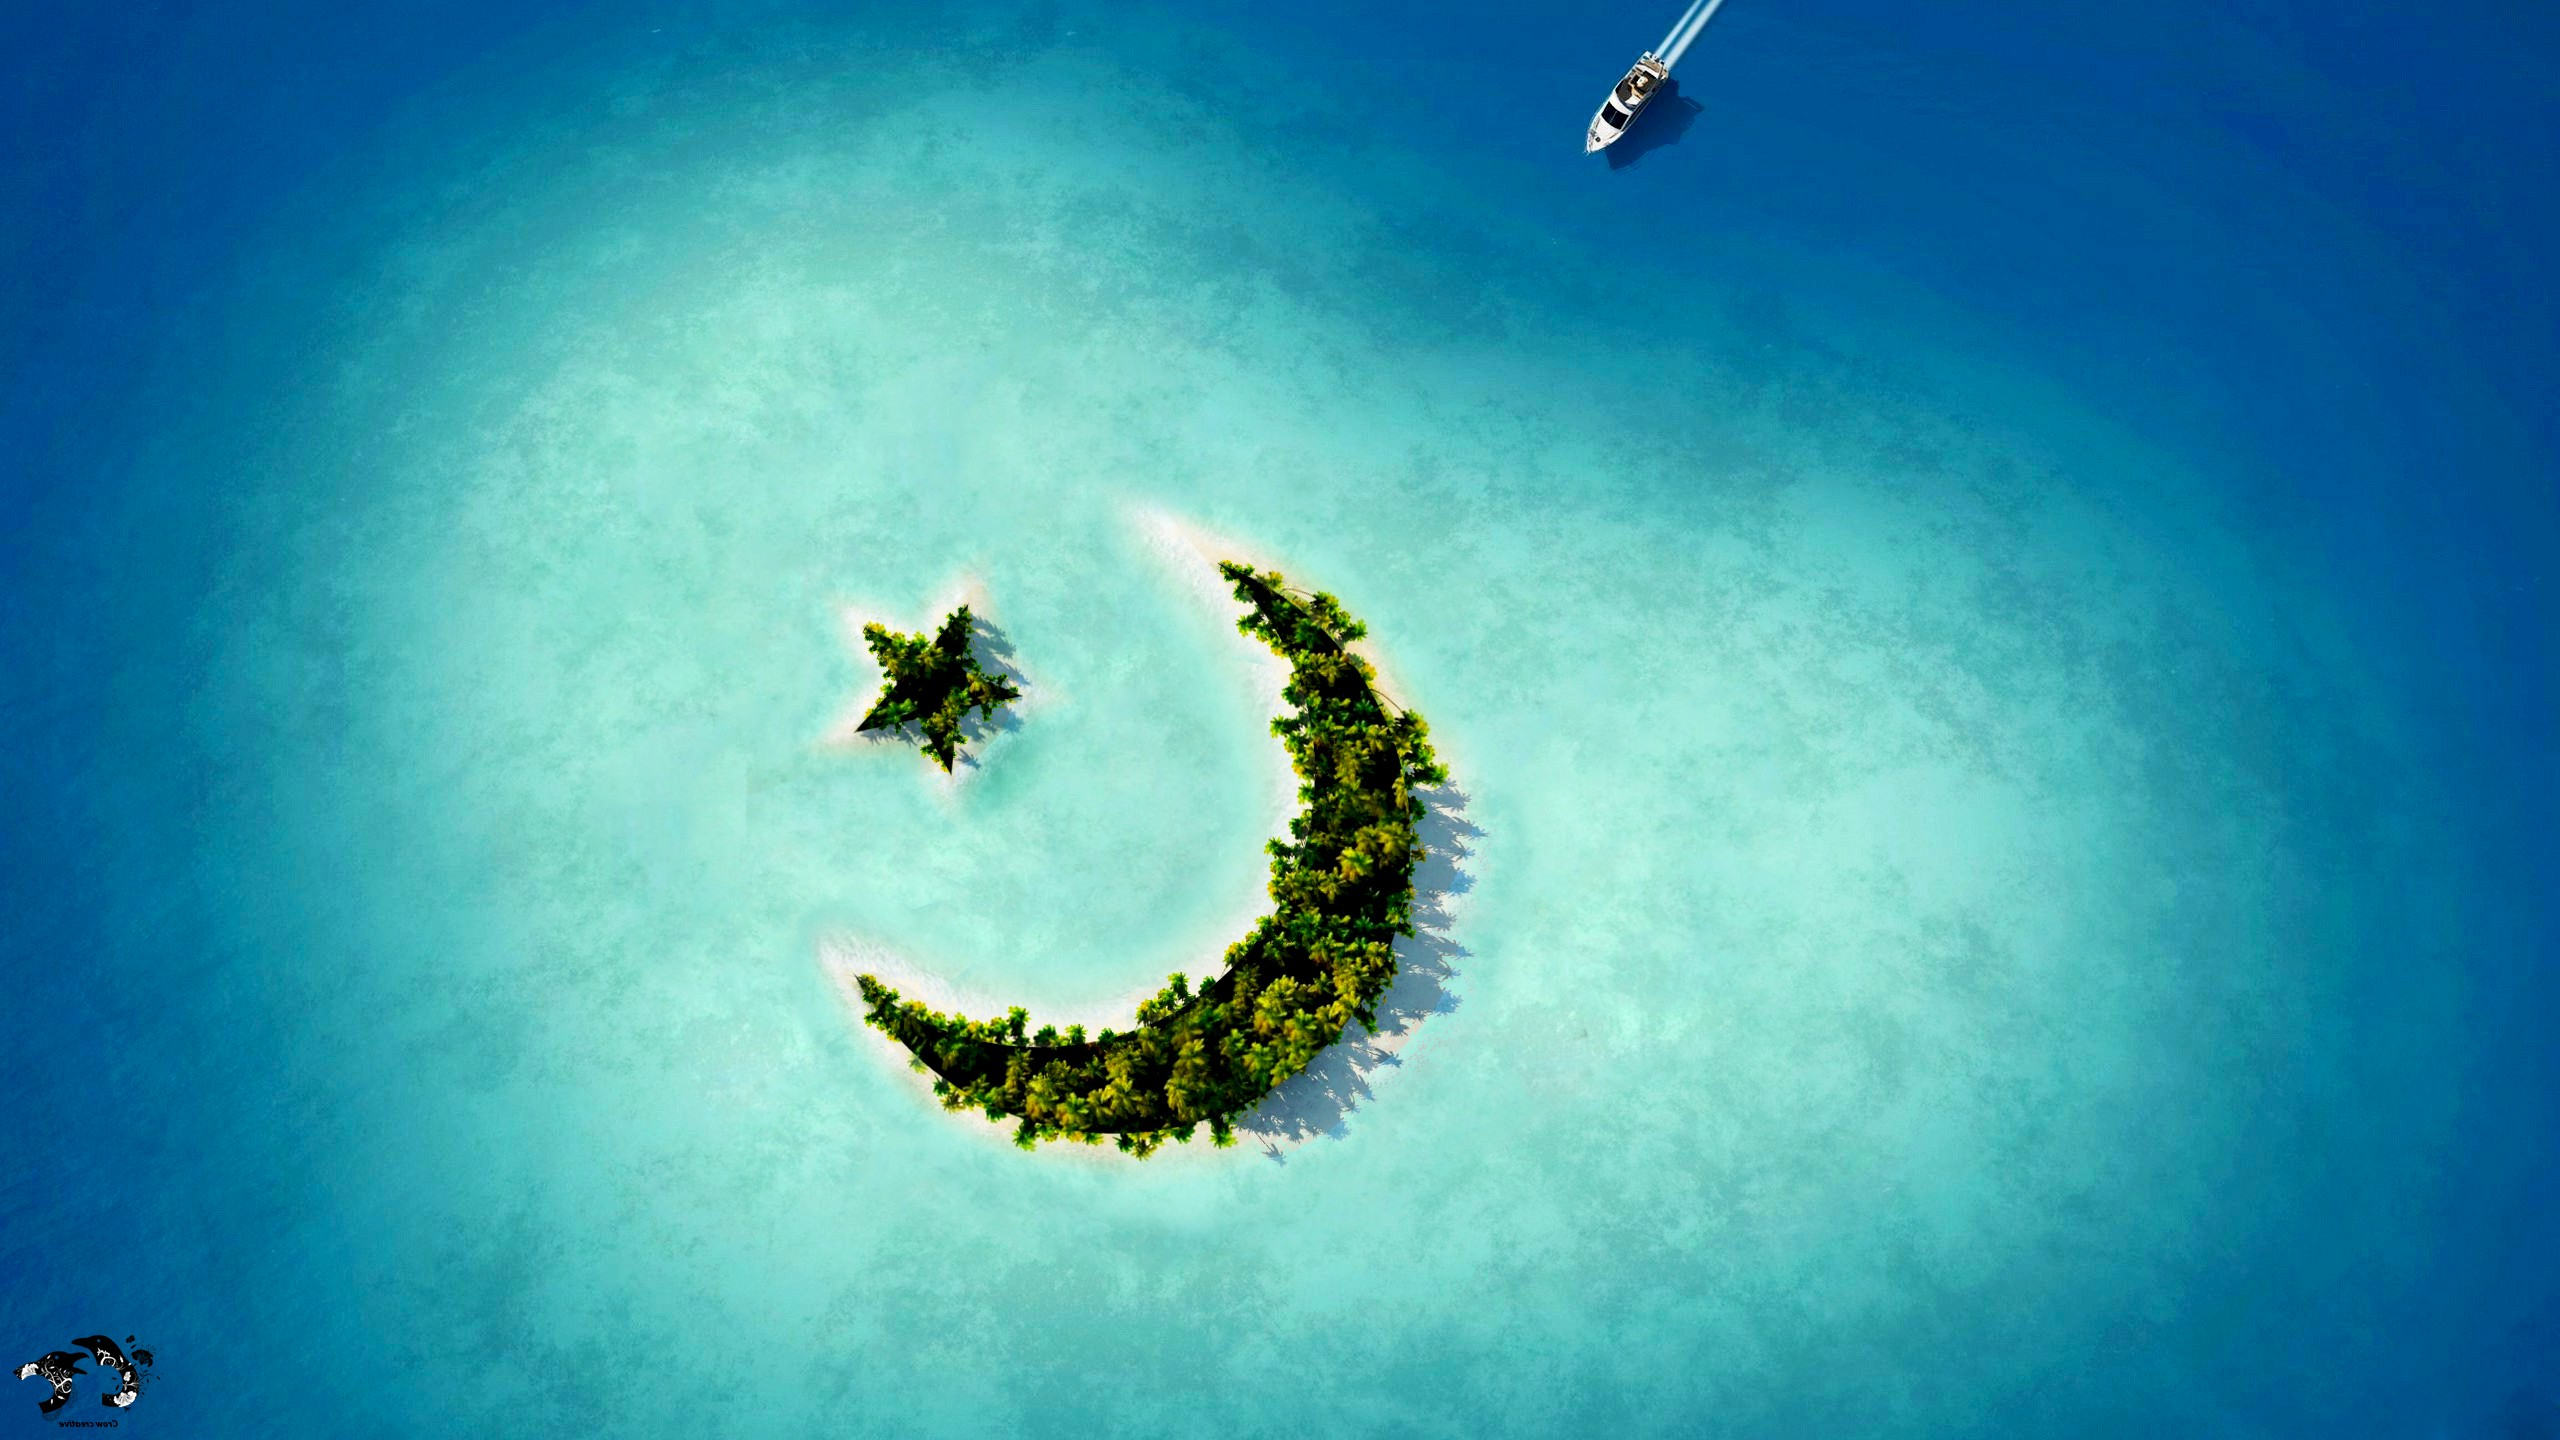 2560x1440 crescent moon star island 1440p resolution hd 4k